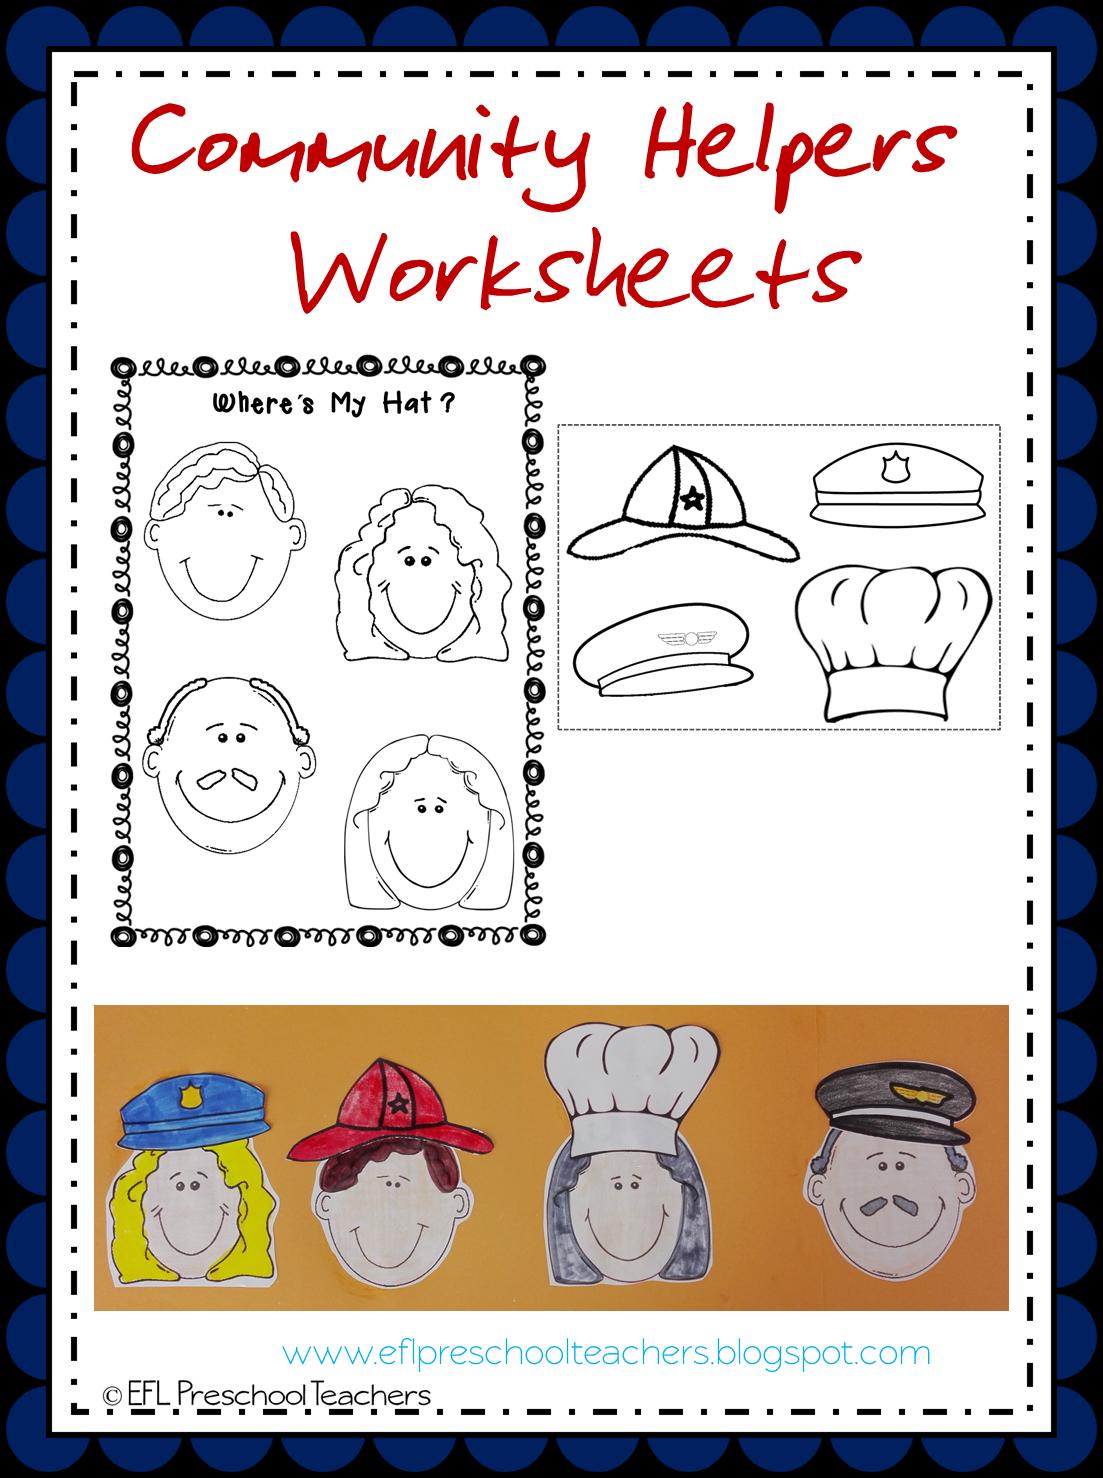 ESLEFL Preschool Teachers Community Helpers Worksheets and More – Community Helpers Worksheets